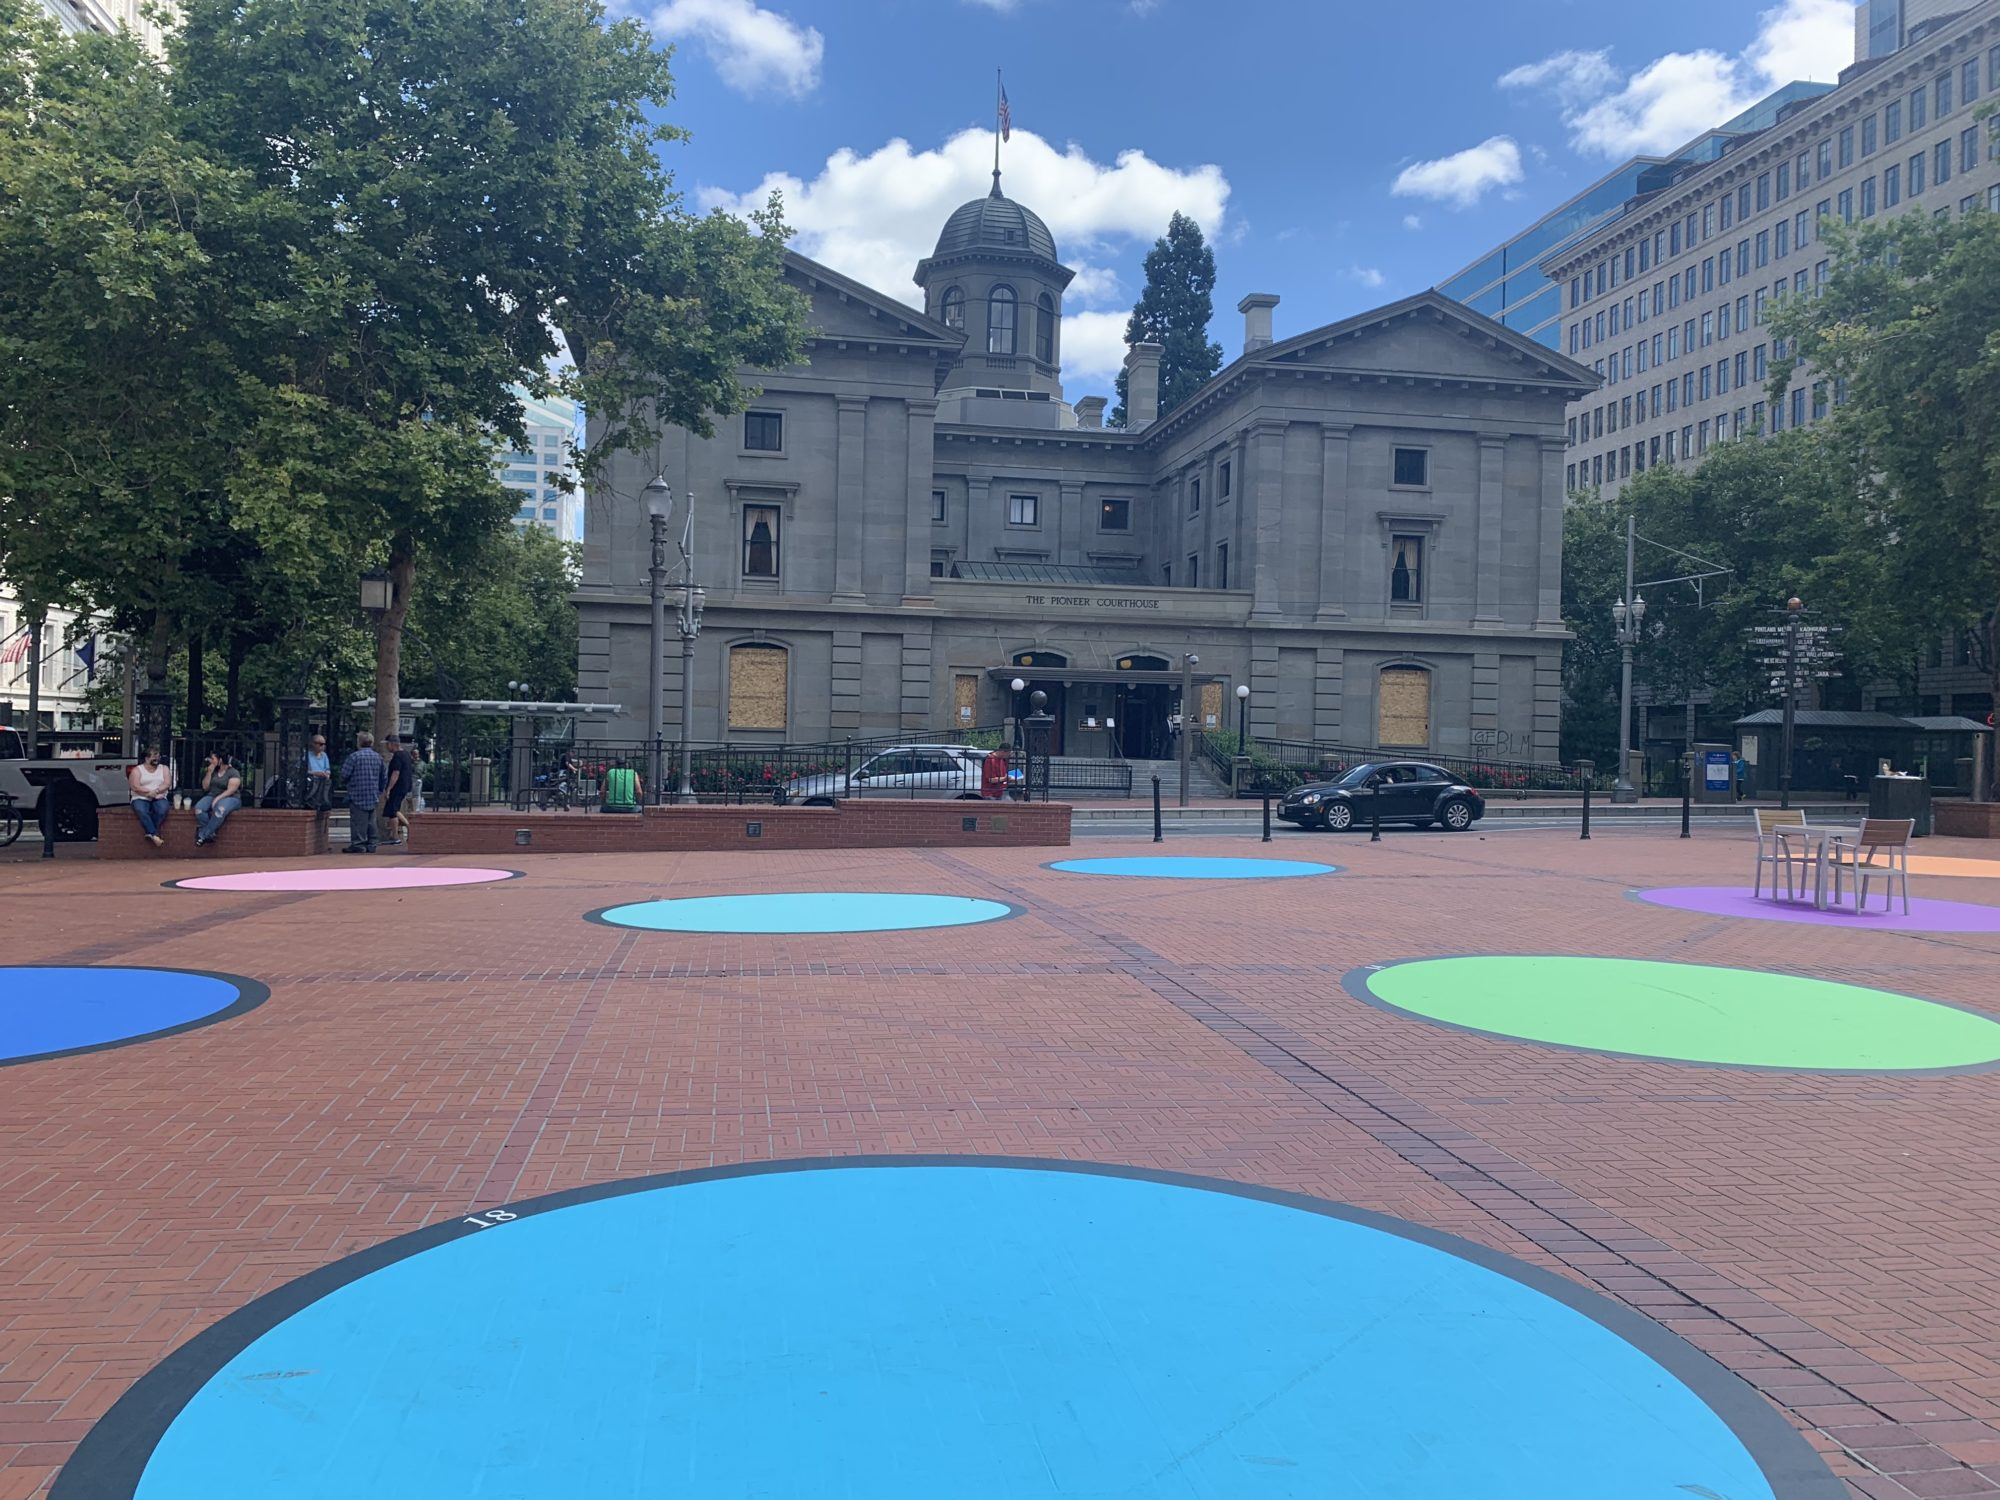 Larissa Birdseye at Polka Dot Courthouse Square